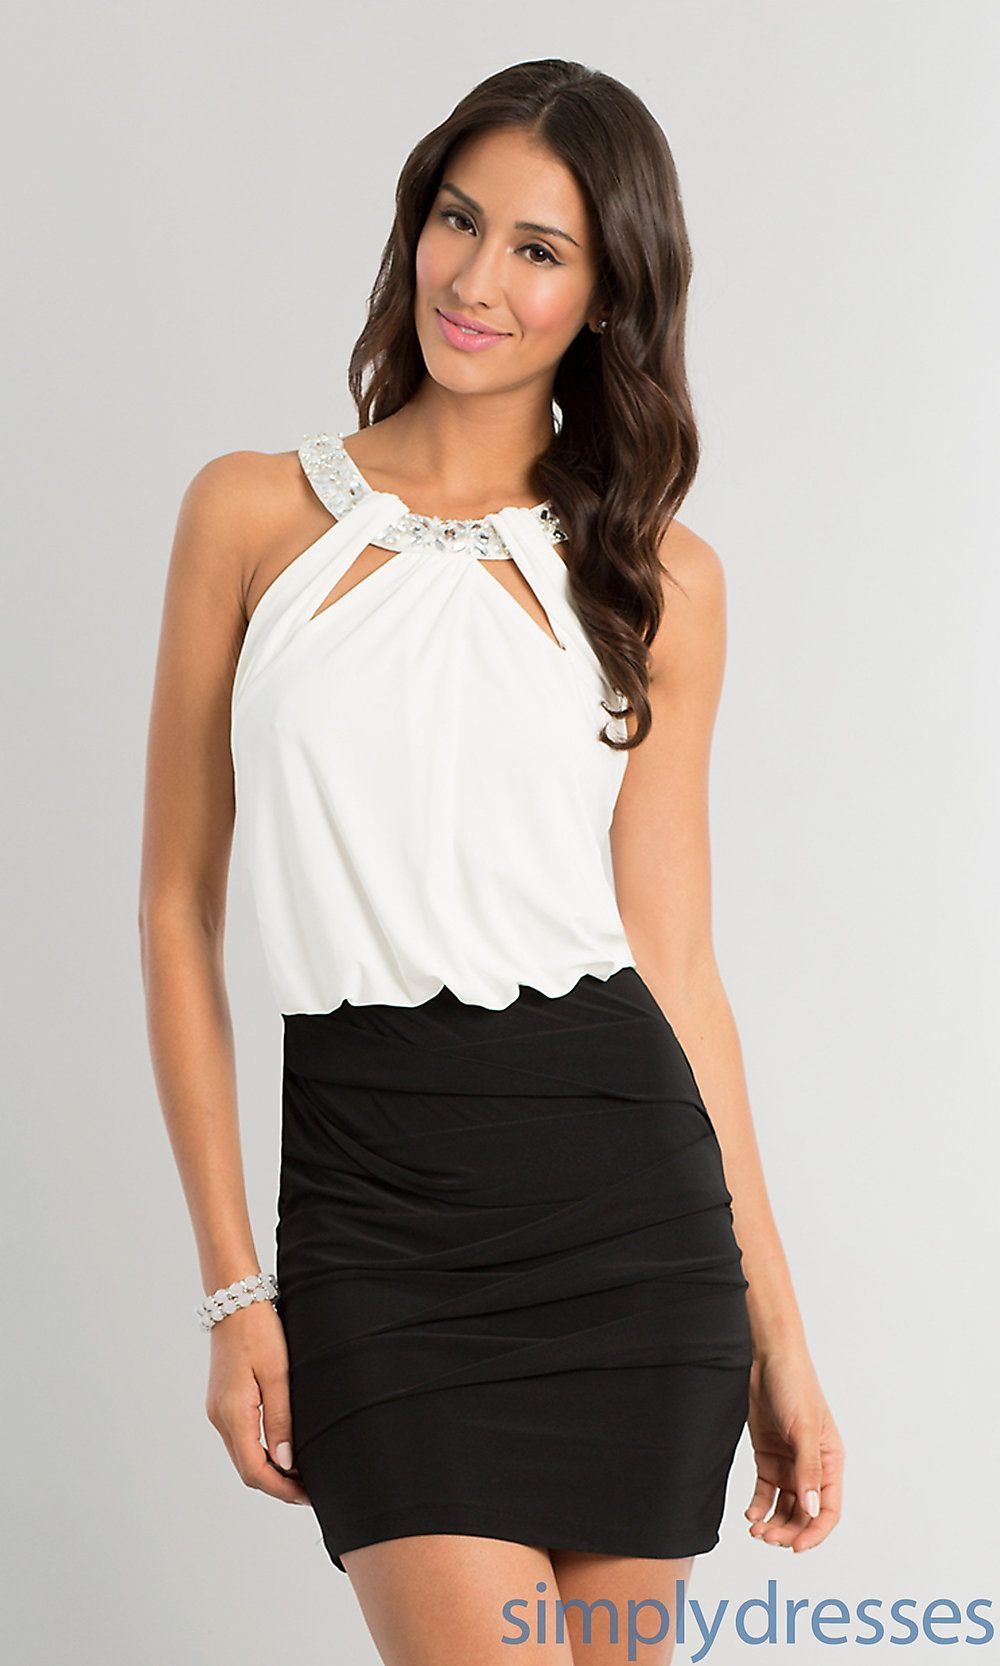 Dress short high neck sleeveless dress simply dresses do it